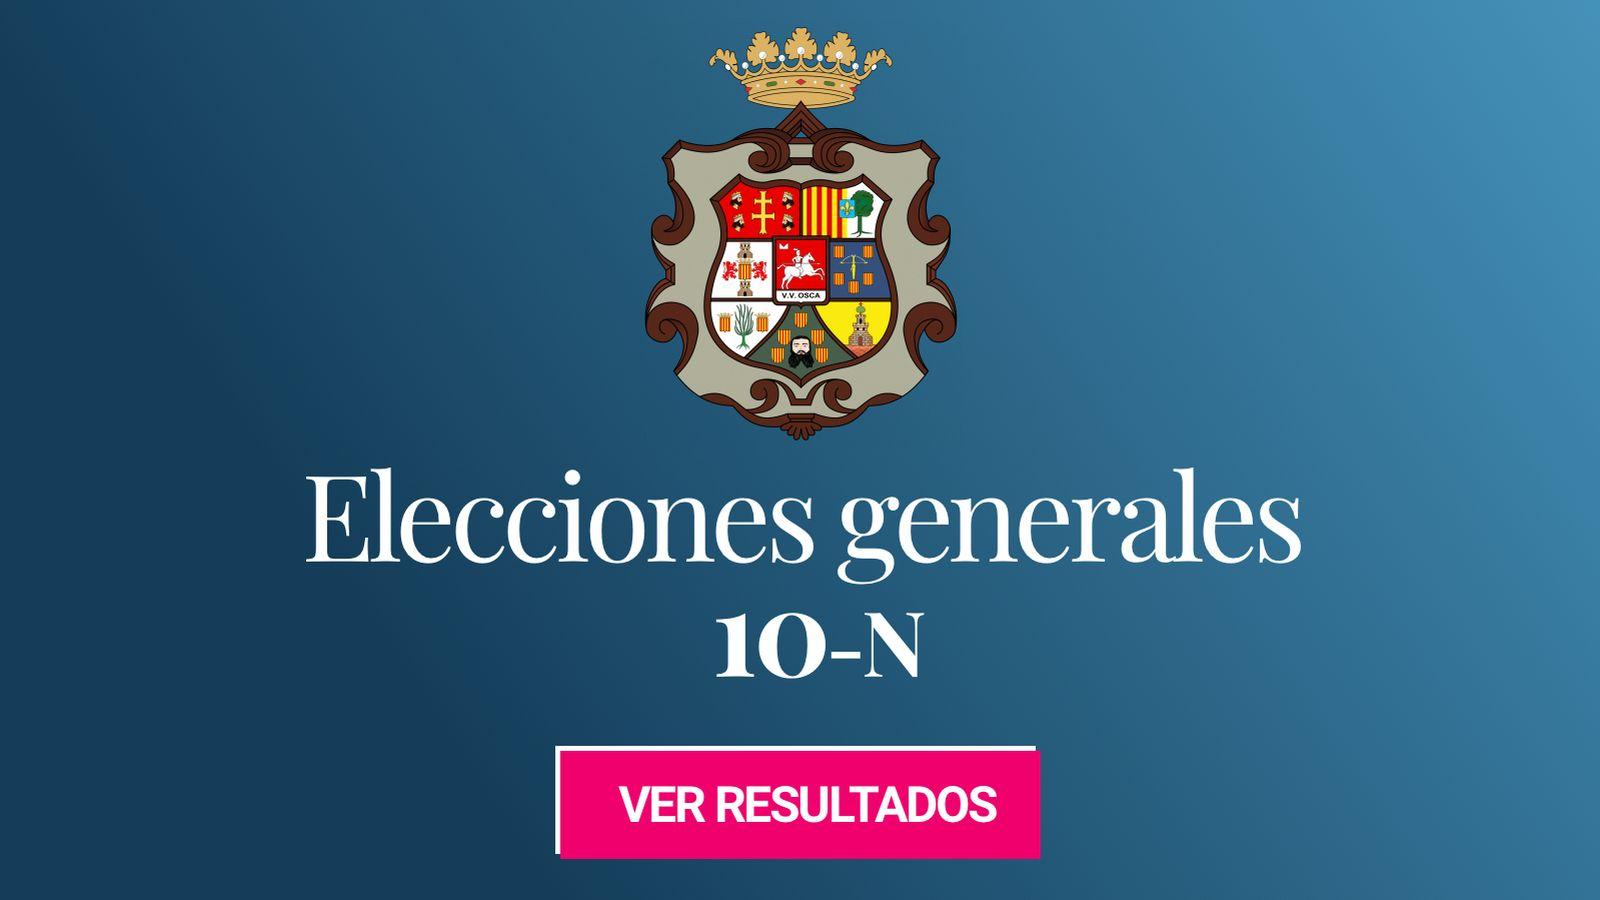 Foto: Elecciones generales 2019 en la provincia de Huesca. (C.C./Willtron)